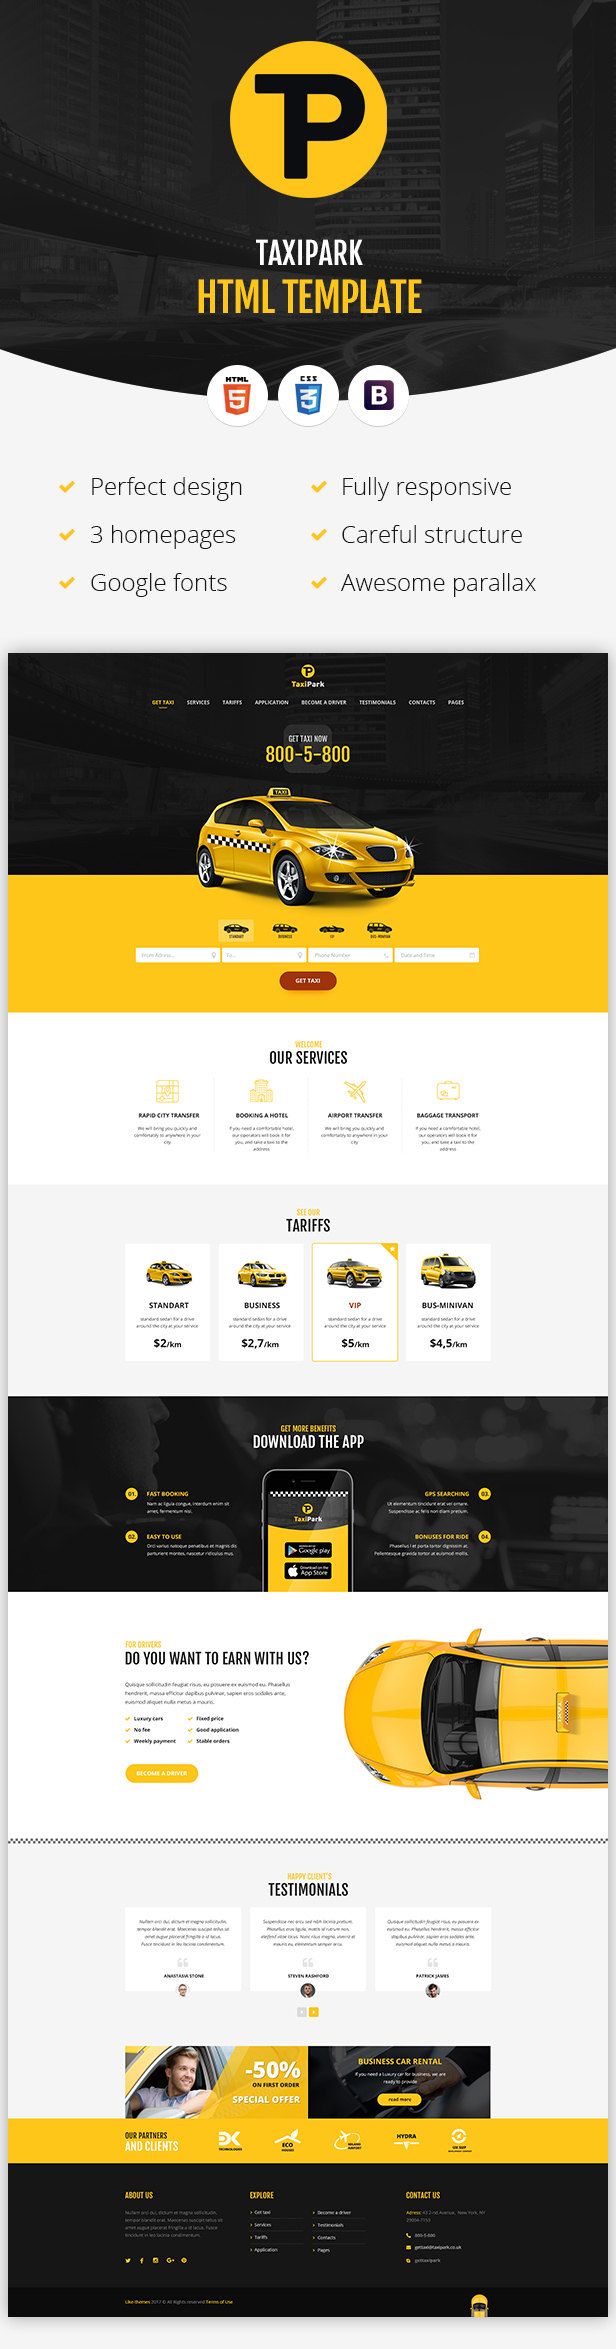 TaxiPark - Taxi Cab Service Company HTML5 Template - 2